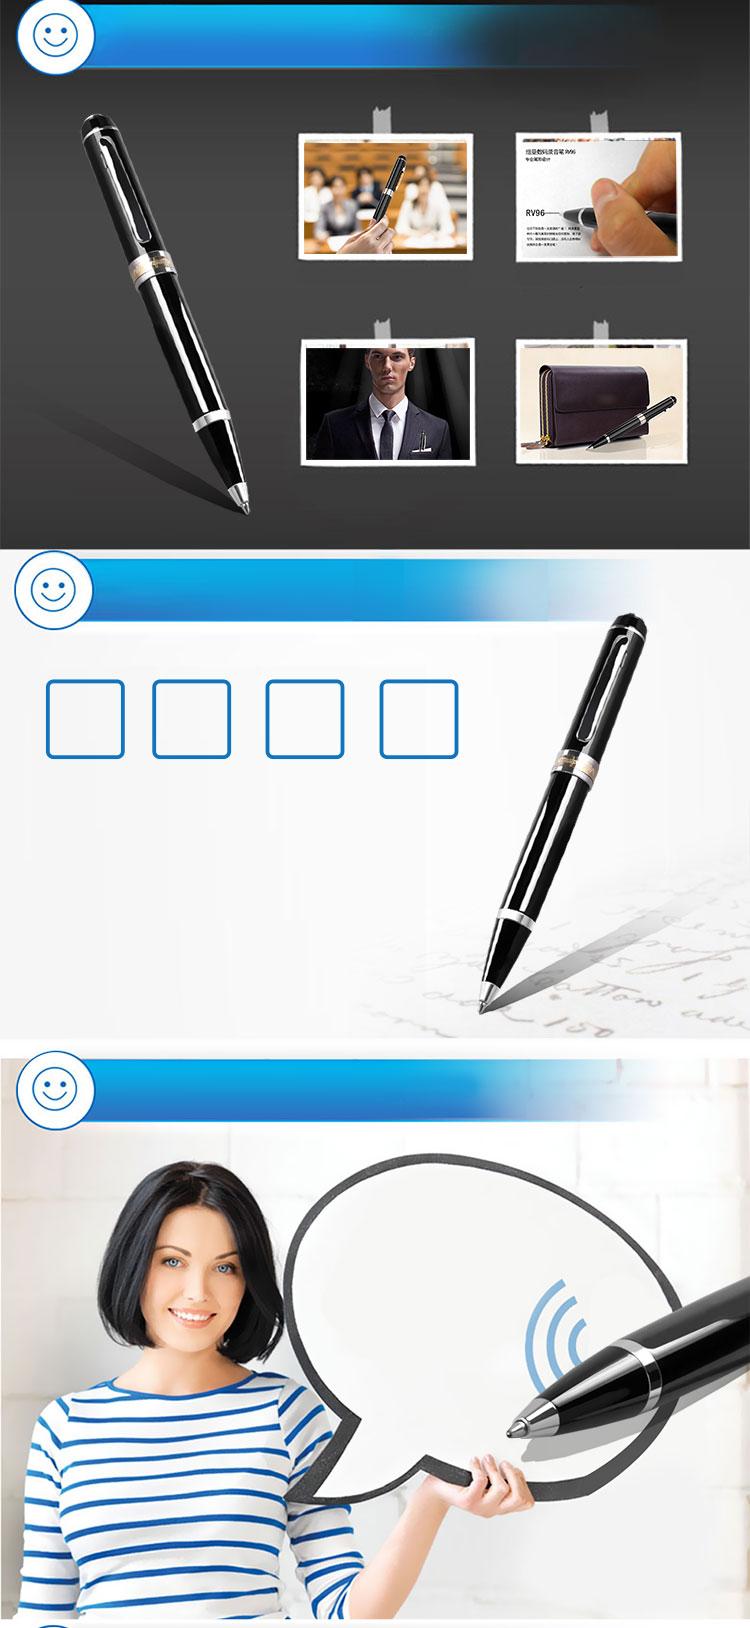 Newman (Newsmy) RV96 8G black digital pen-shaped recording pen professional micro-HD noise reduction MP3 player - Jingdong